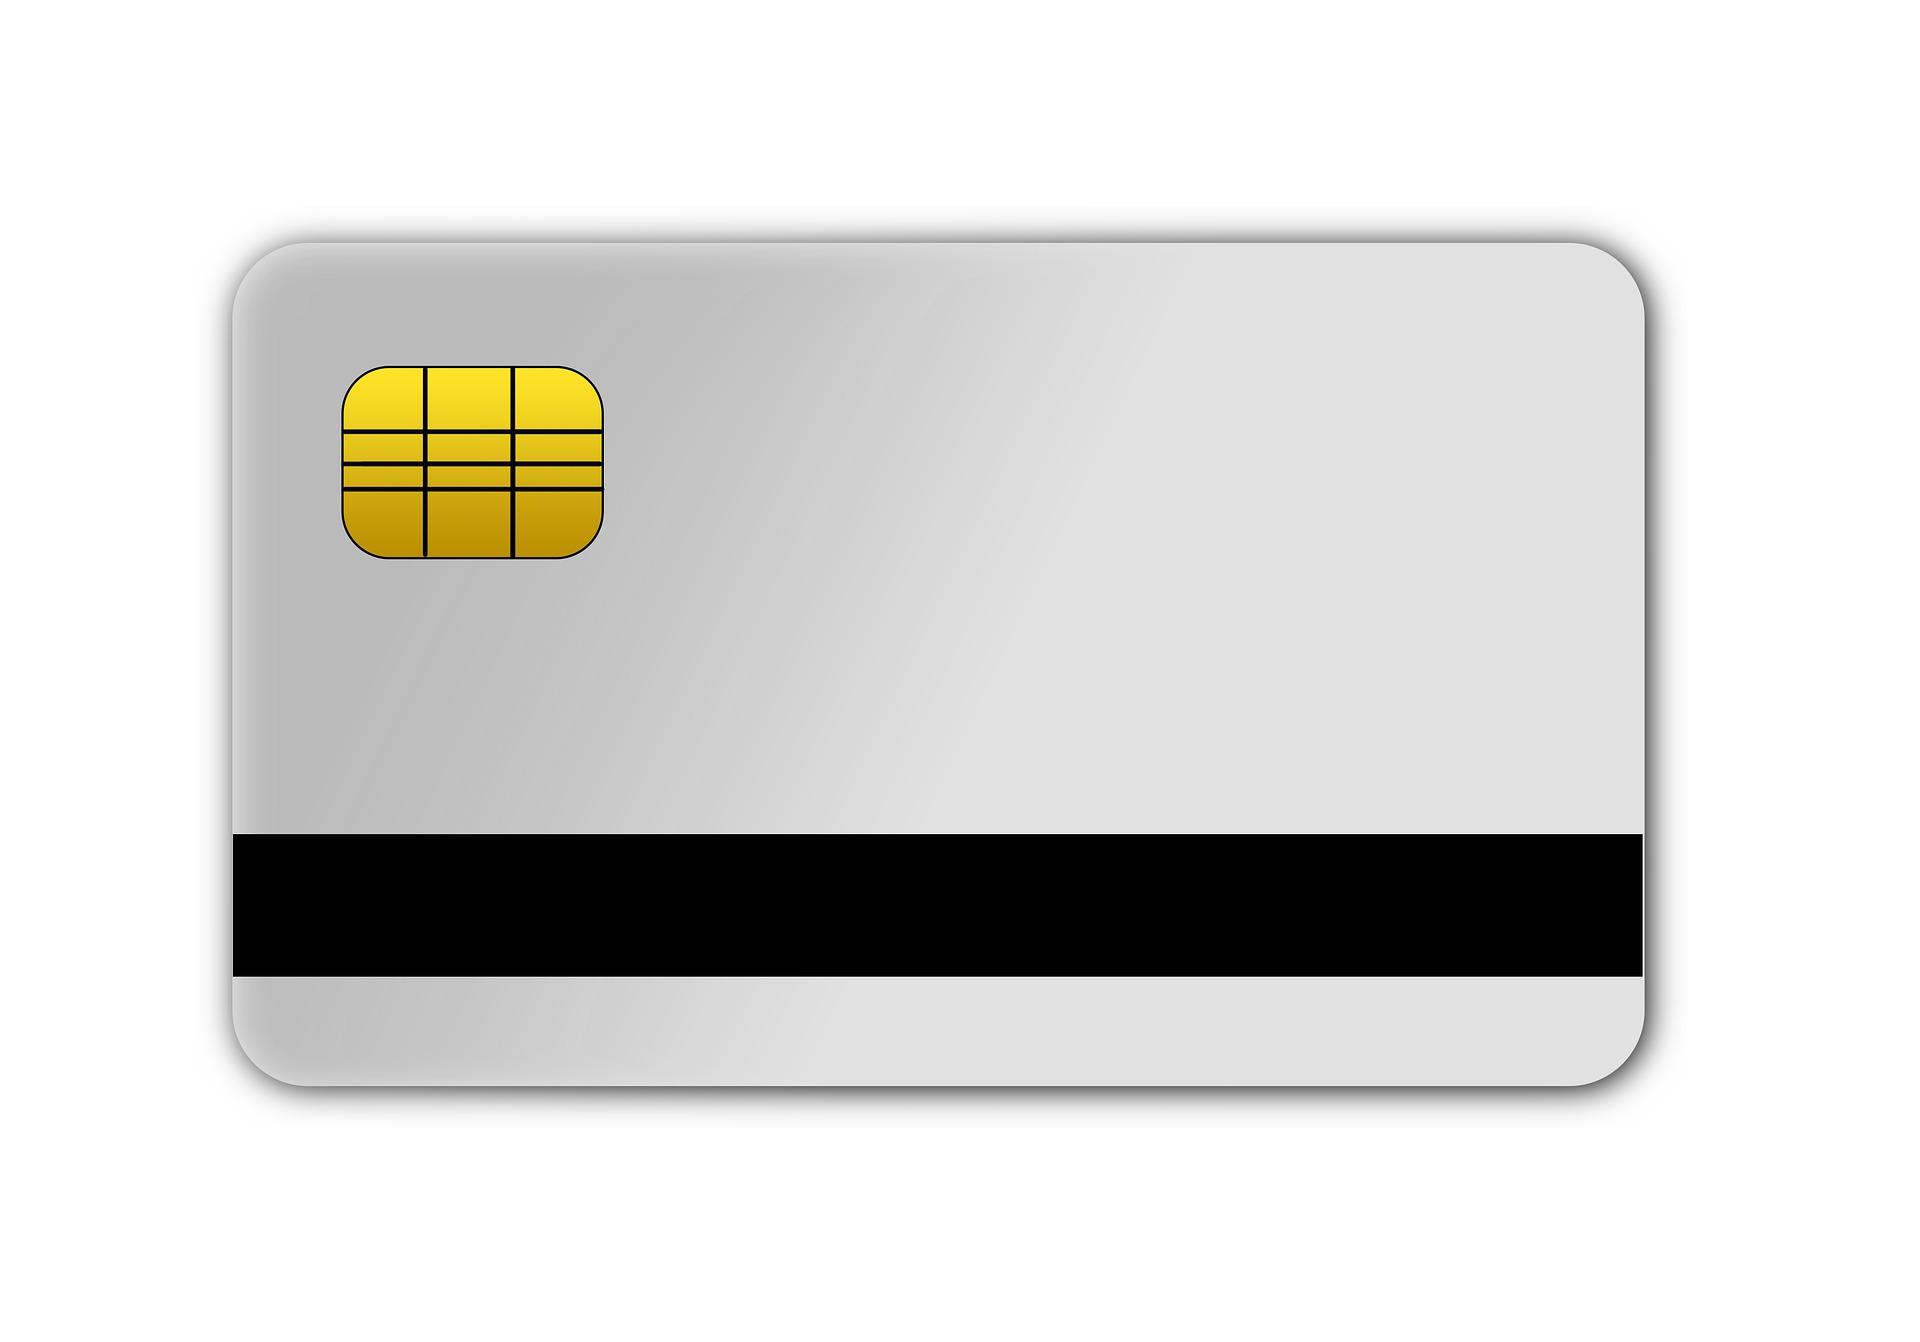 credit-card-2010884_1920 (1)